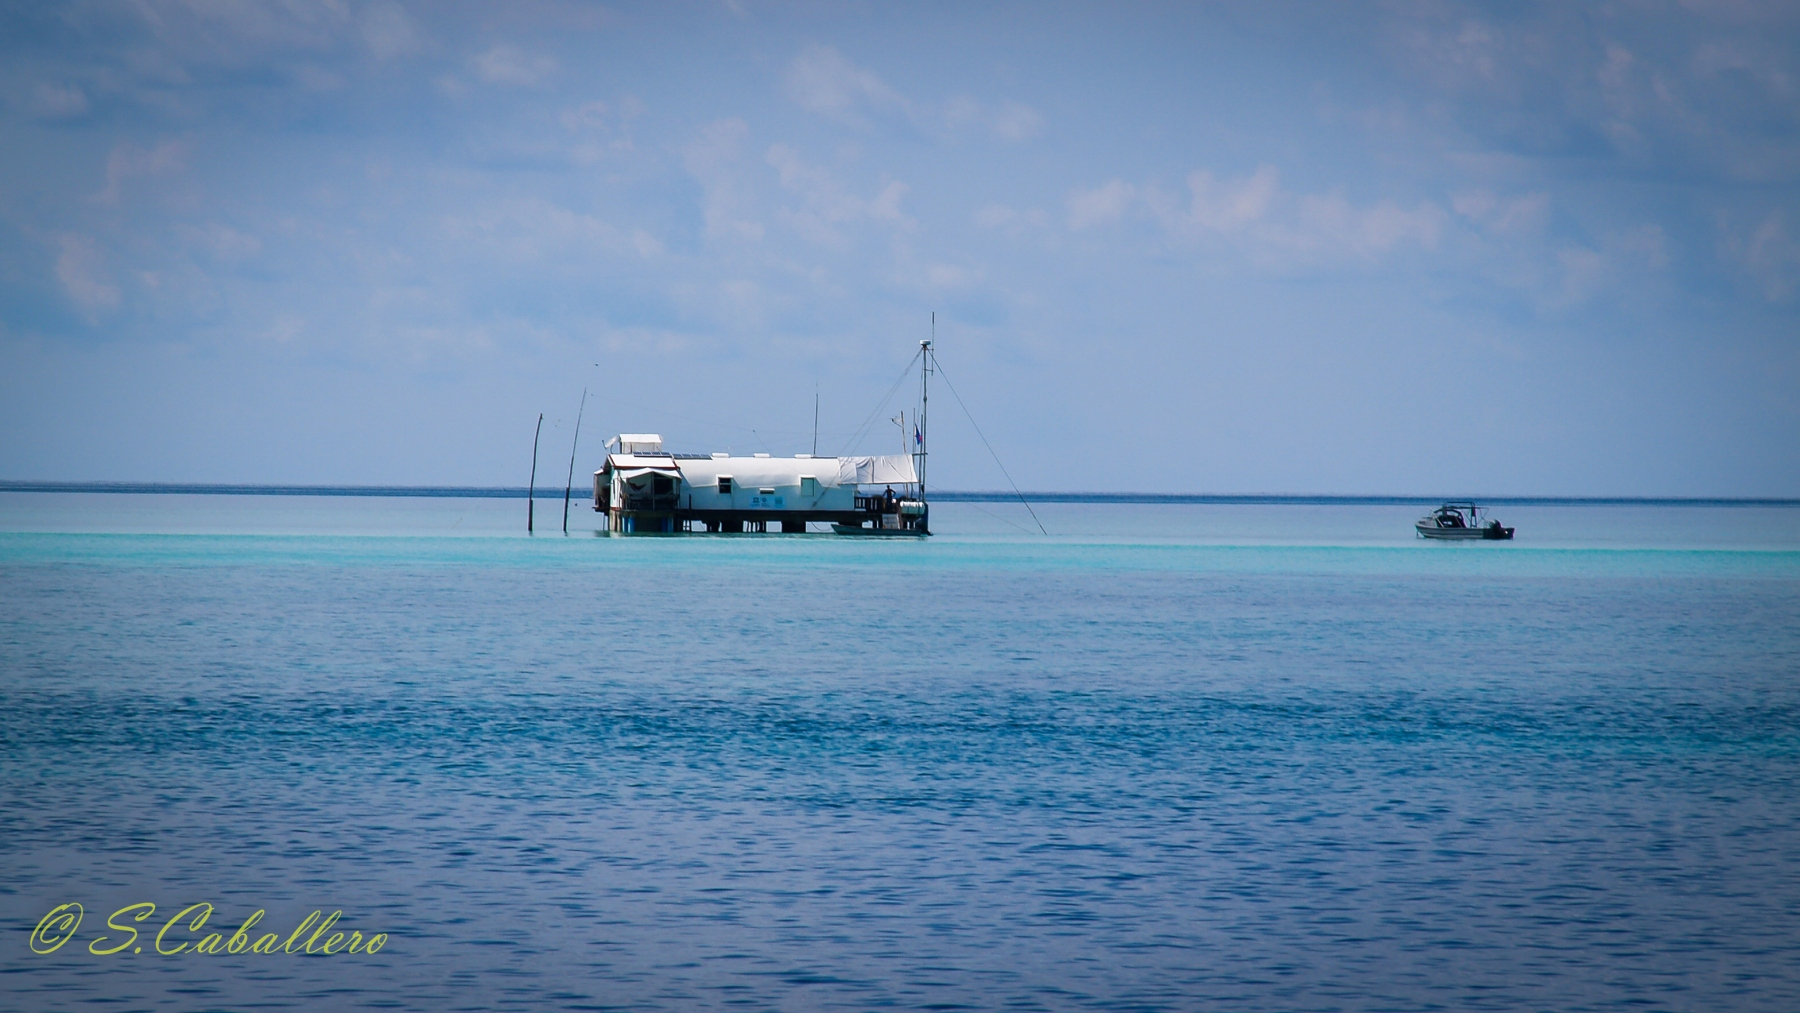 Tubbtaha-Reef Ranger-Station